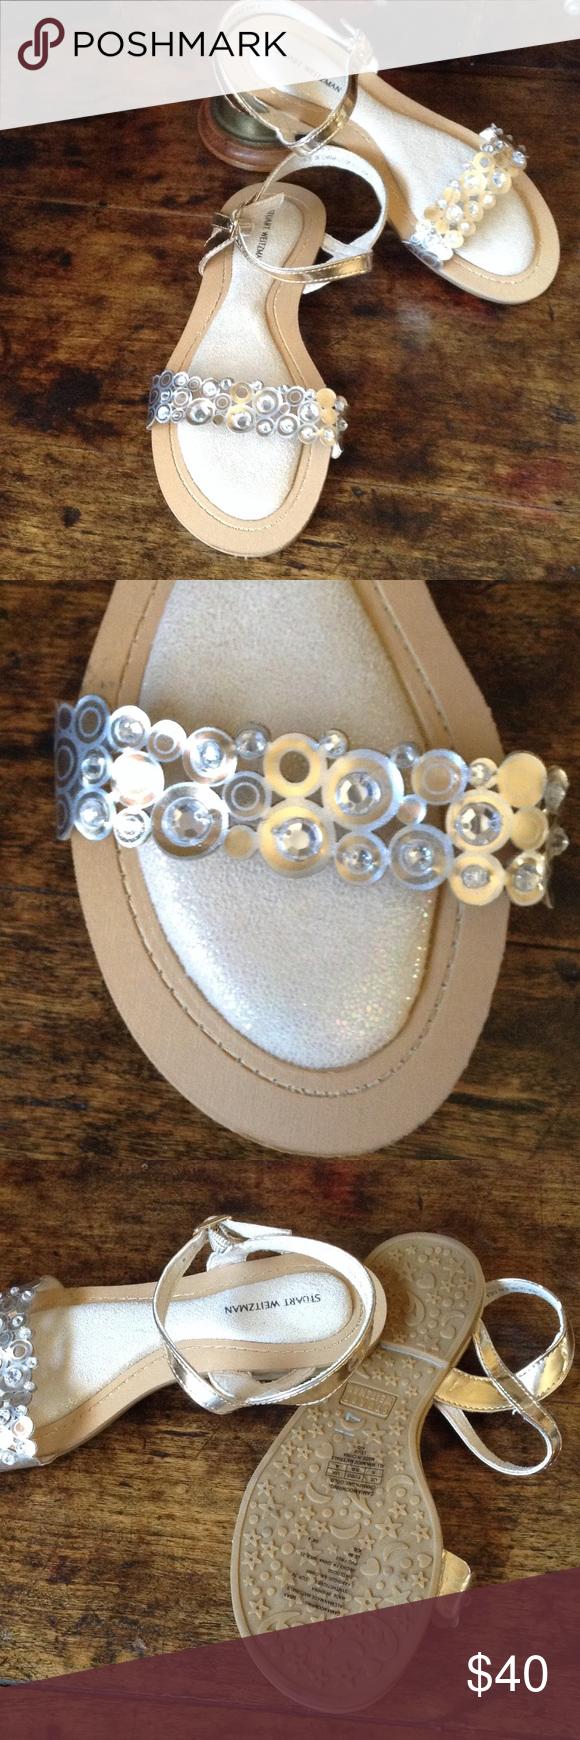 🌺SALE🌺 Stuart Weitzman Crystal Sandals New lazar cut crystal sandals. Color is champagne gold. Stuart Weitzman Shoes Sandals